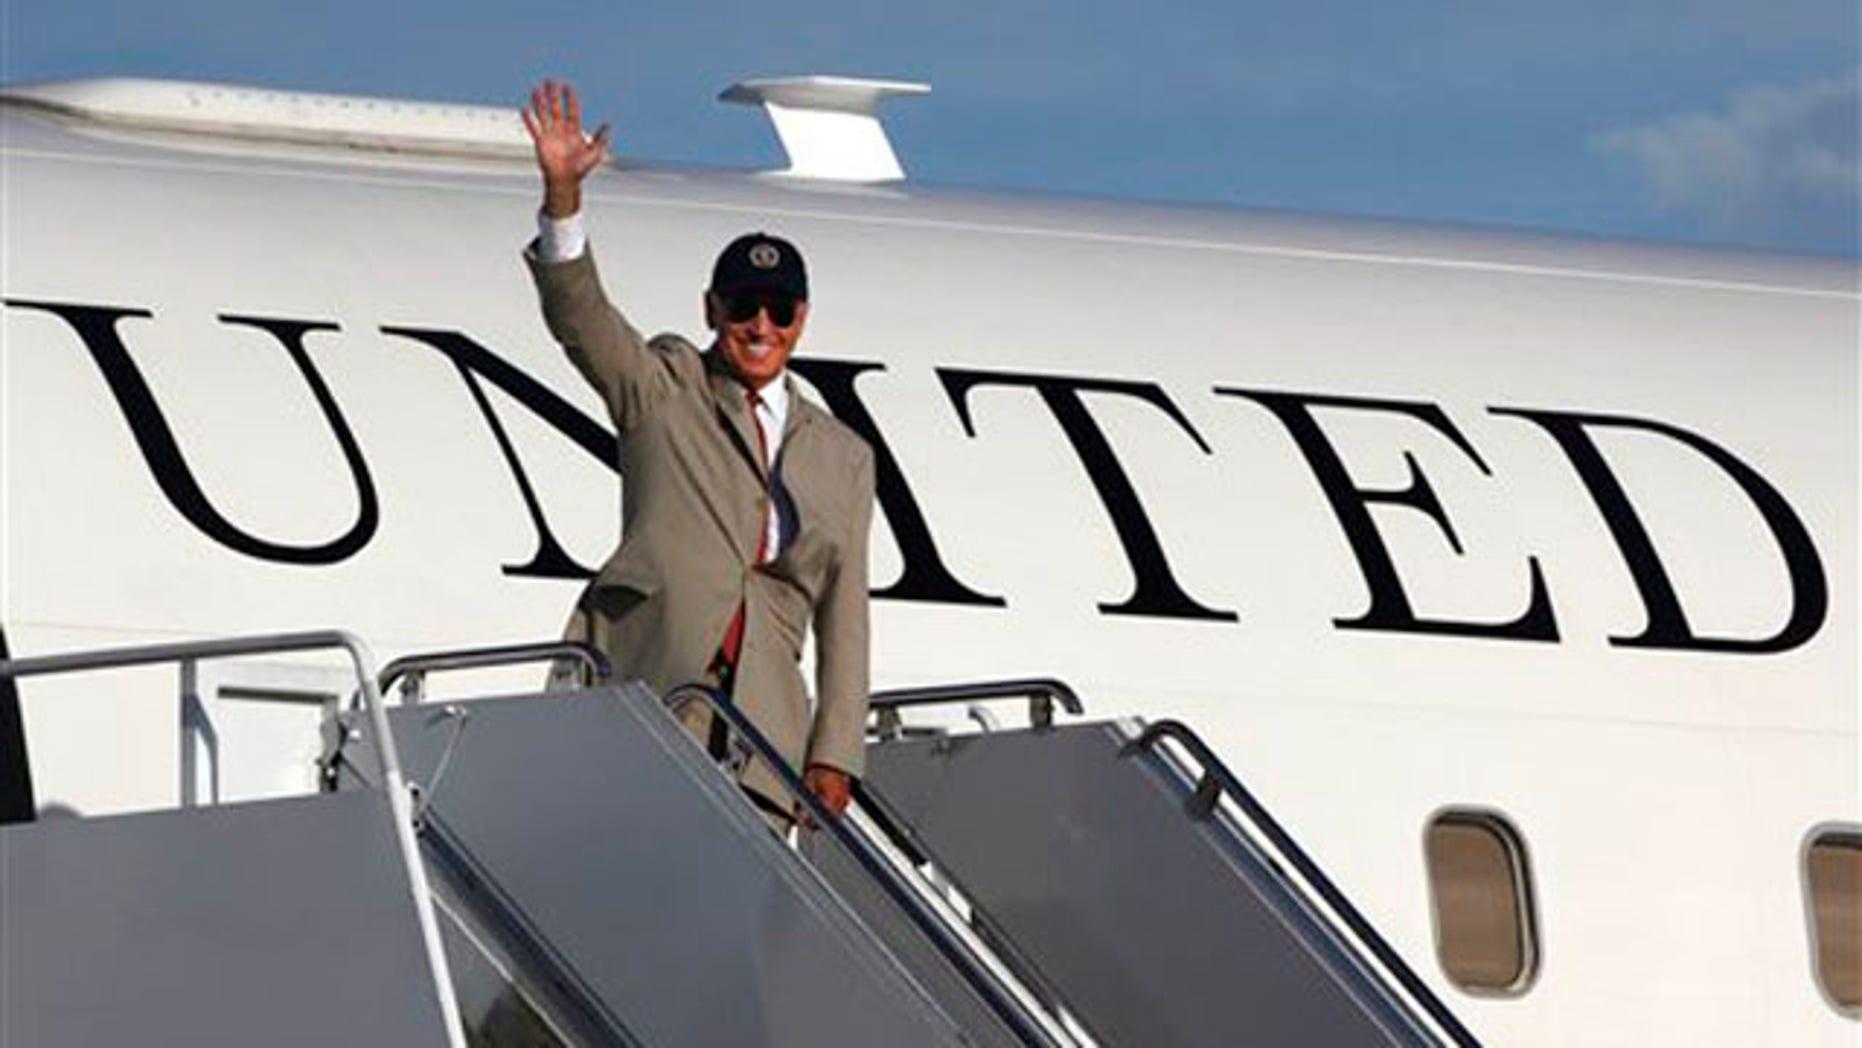 August 24: Vice President Joe Biden waves before boarding his plane at Yokota Air Base, on Tokyo's outskirts.